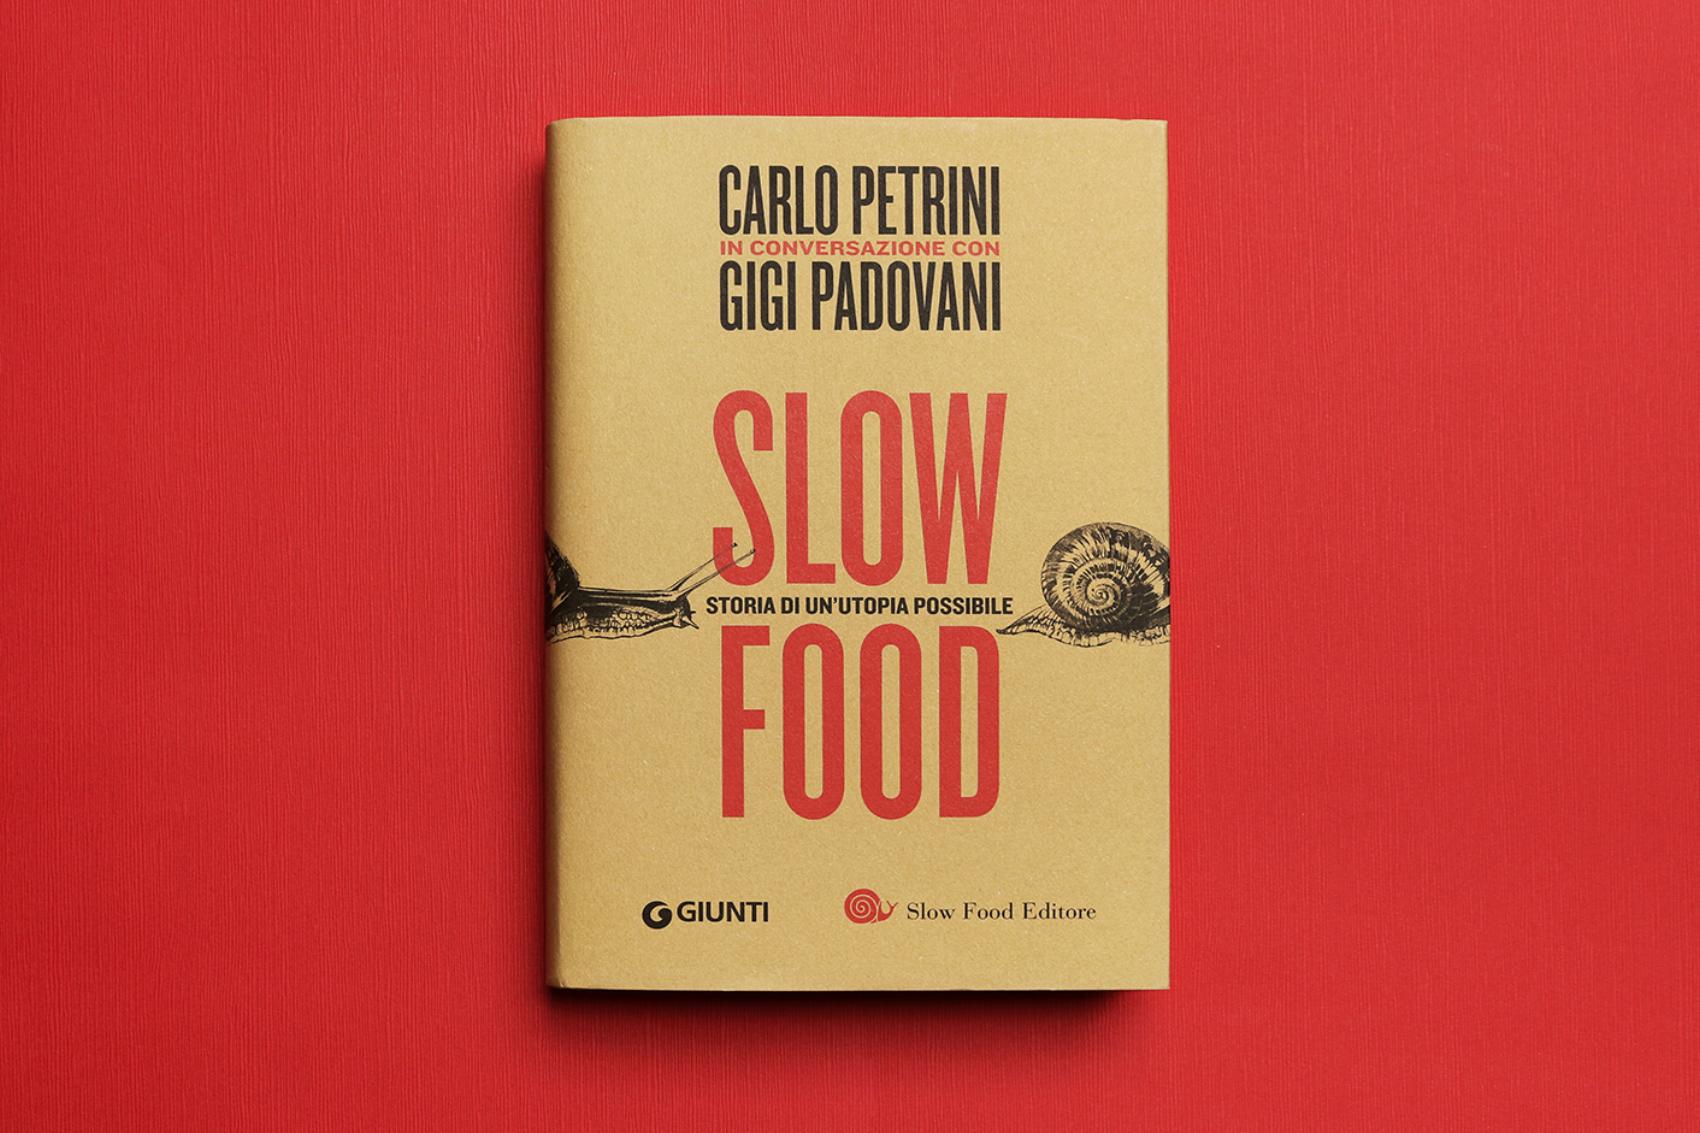 VIRGILLO_slowfood_petrini_padovani_cover